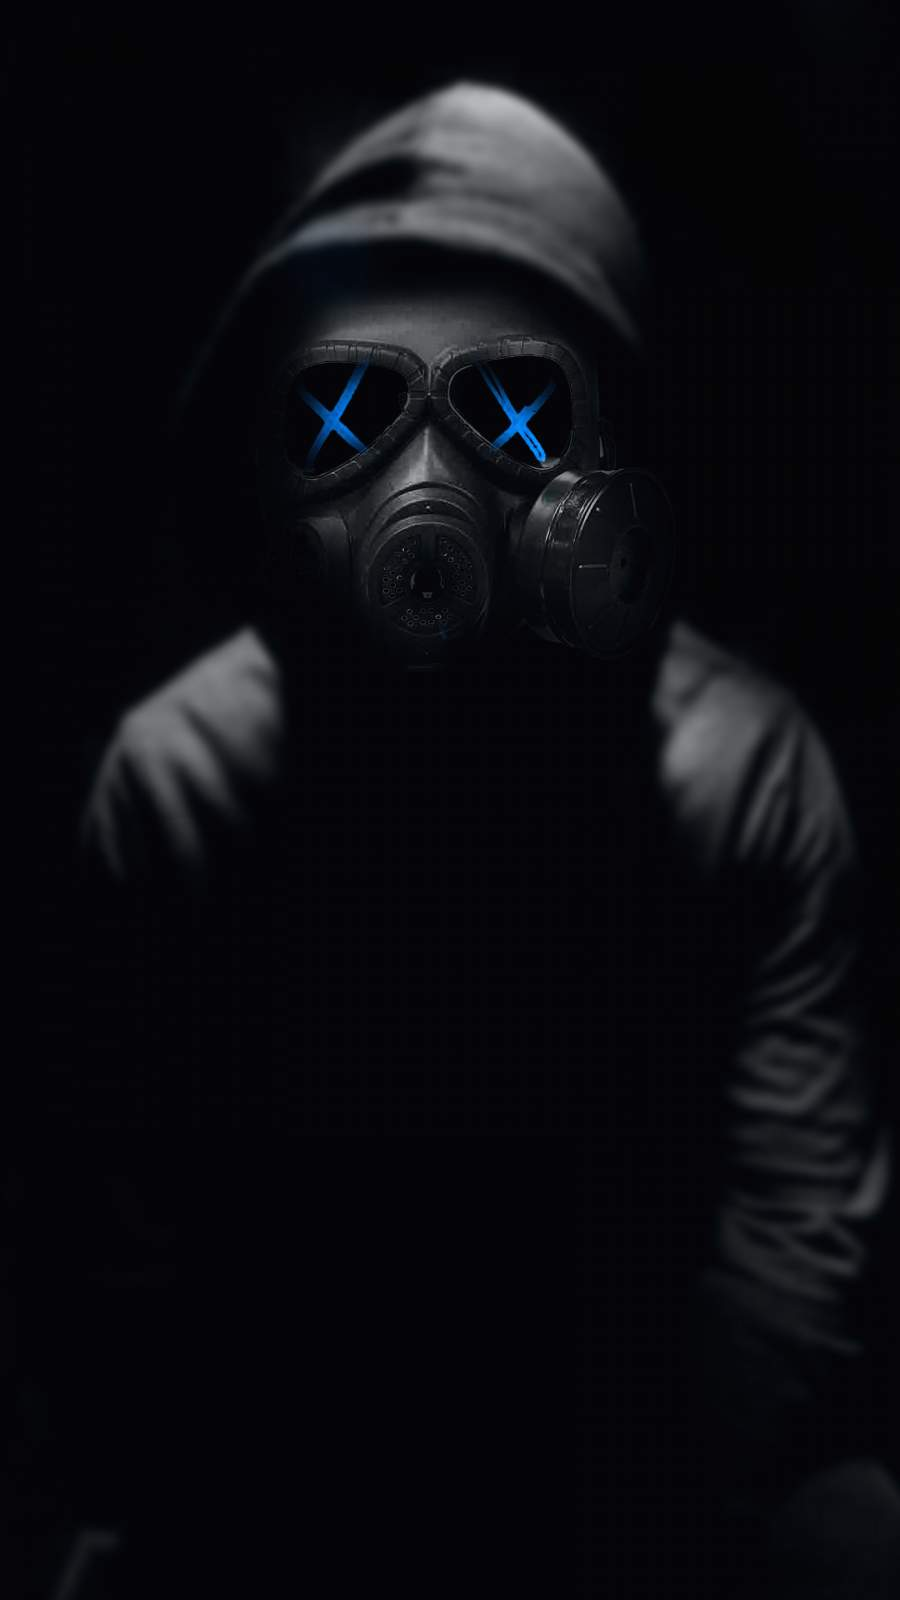 Gas Mask iPhone Wallpaper